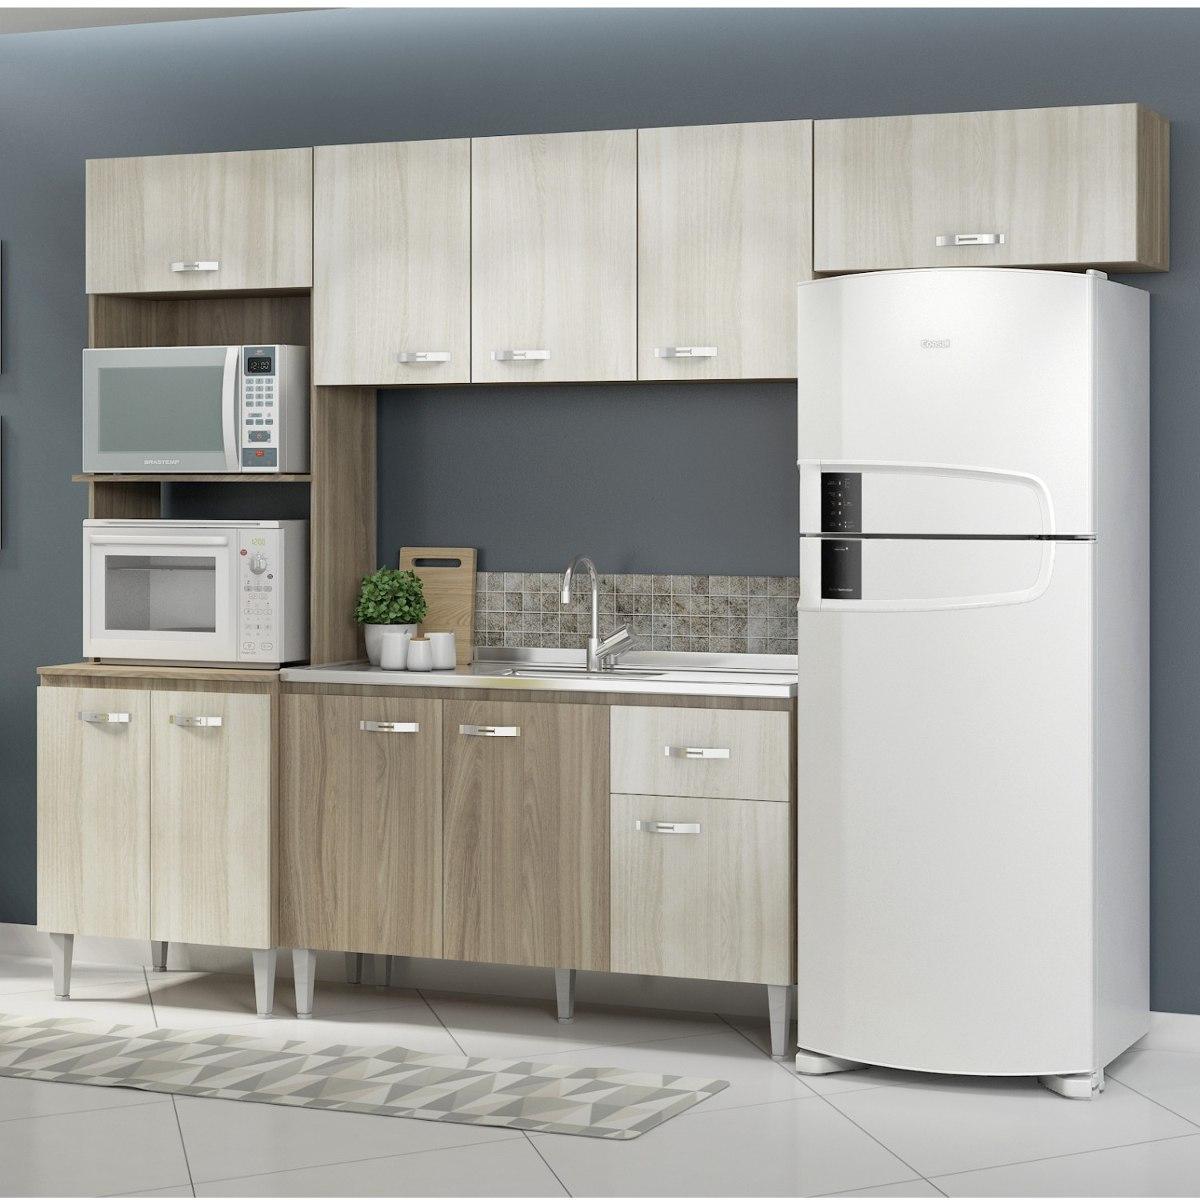 Cozinha Completa 4 M Dulos 10 Portas 1 Gaveta Cris Si Ibwt R 575